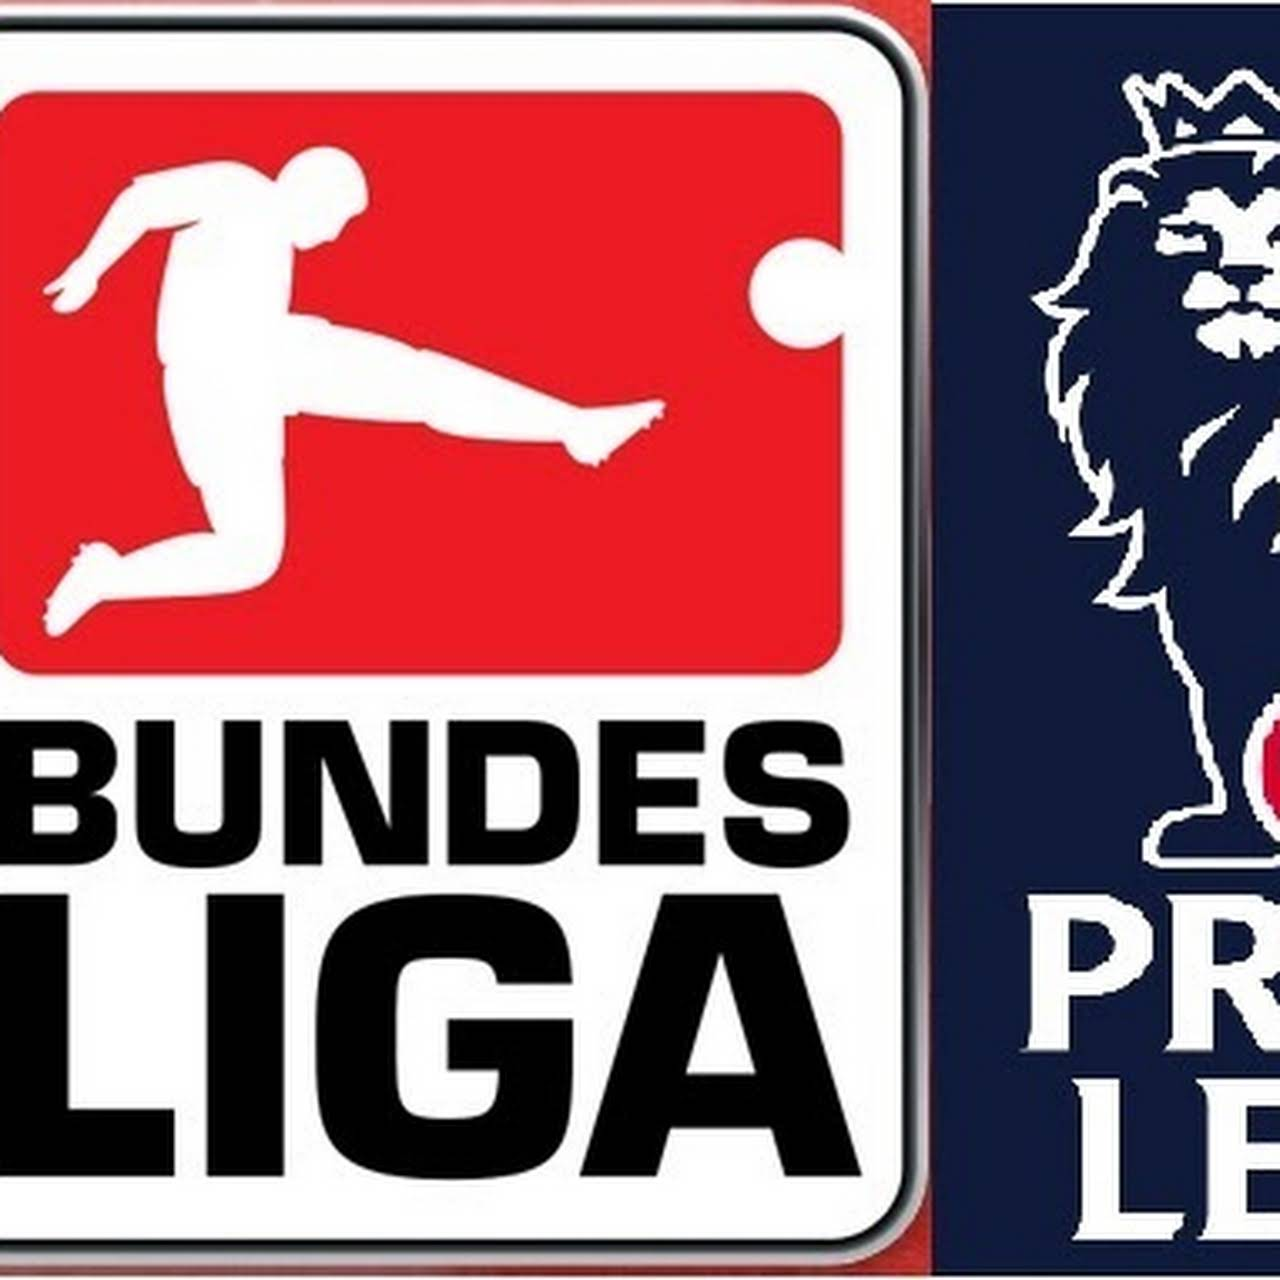 Radost Cafe Sport Bar Premier League Bundesliga Champions League La Liga Nfl Nba Nhl Afl Arl Formula 1 And All Other Sports